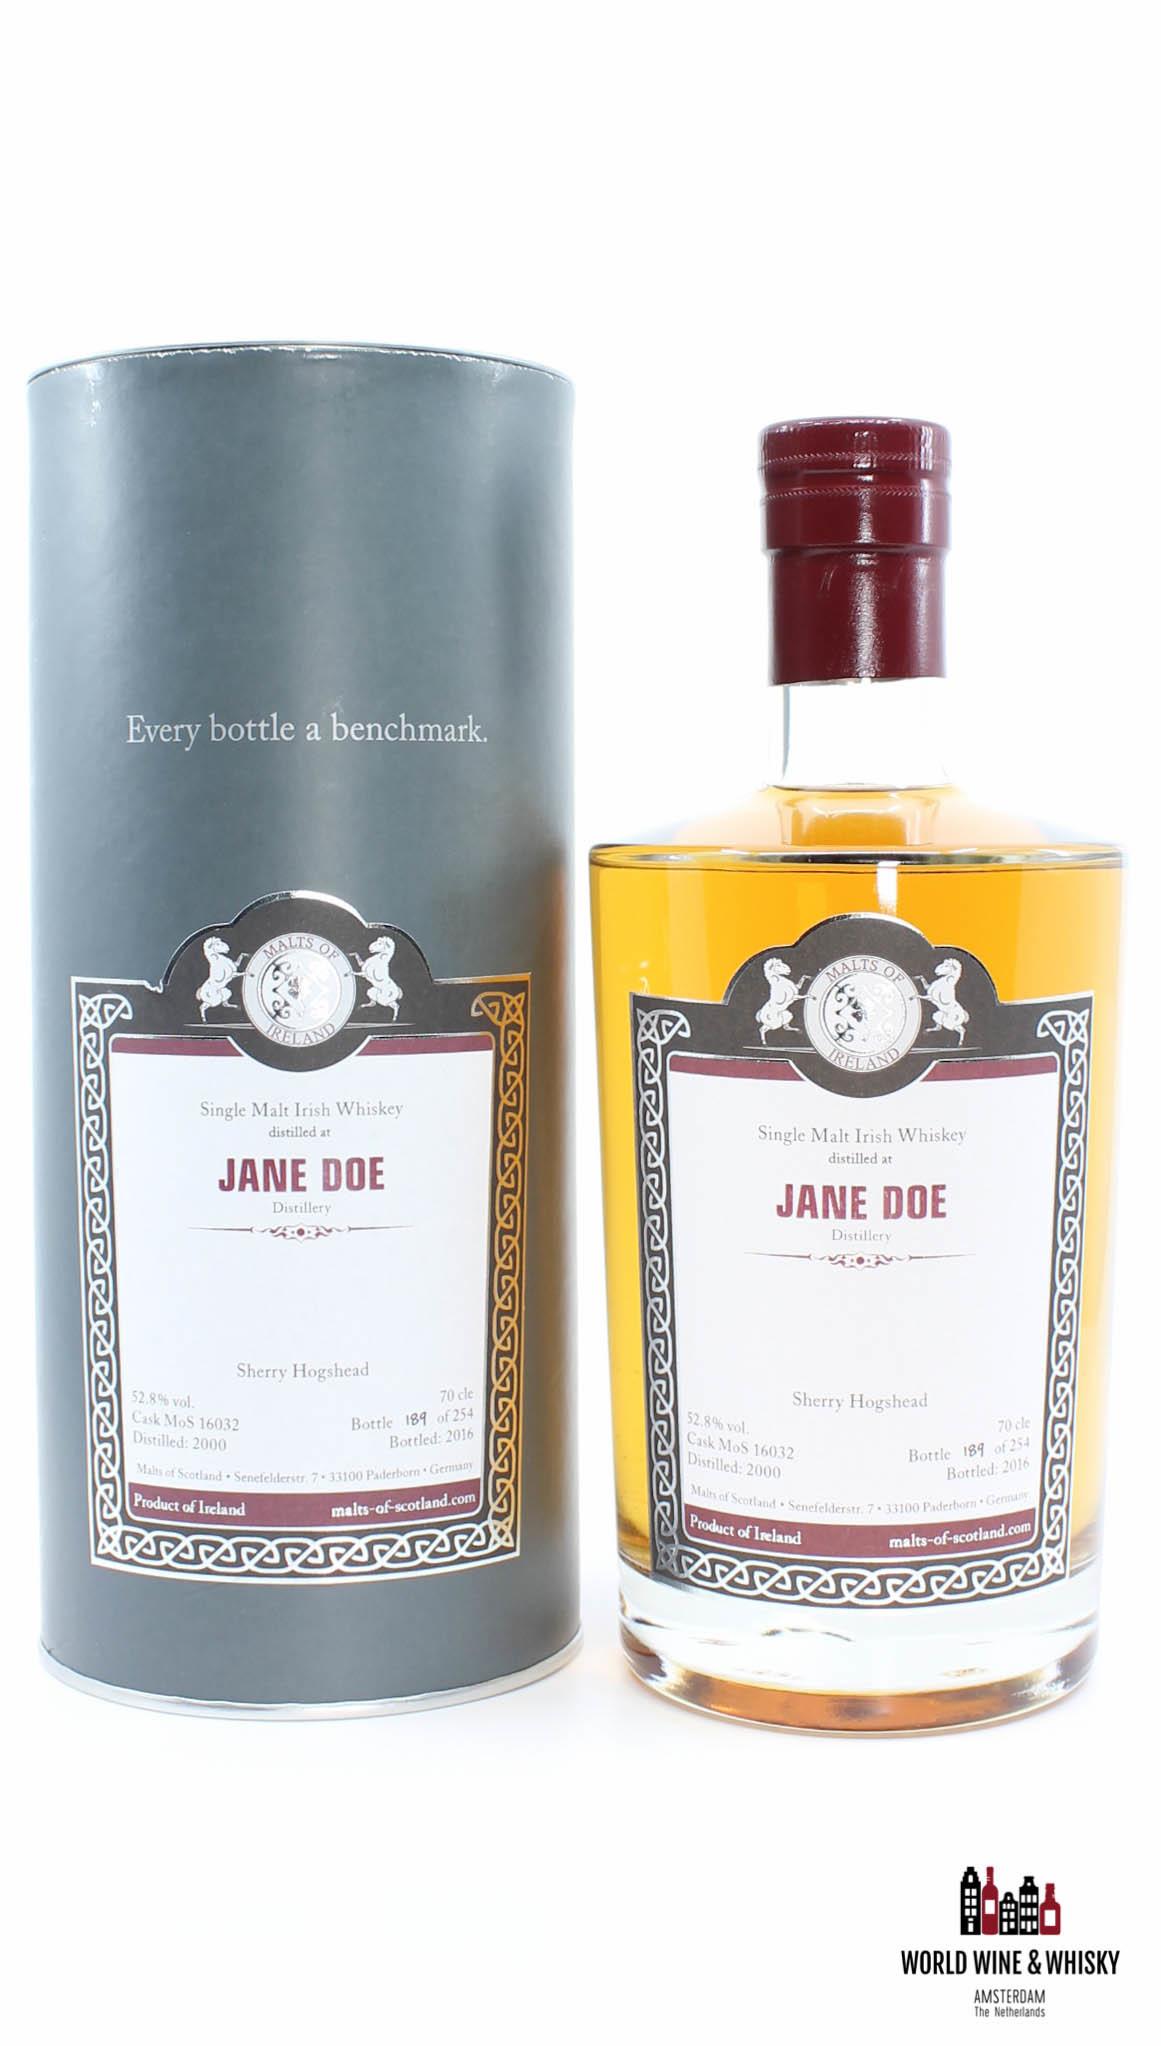 Jane Doe Jane Doe 16 Years Old 2000 2016 Malts of Scotland - Cask MoS 16032 52.8% (one of 254 bottles)